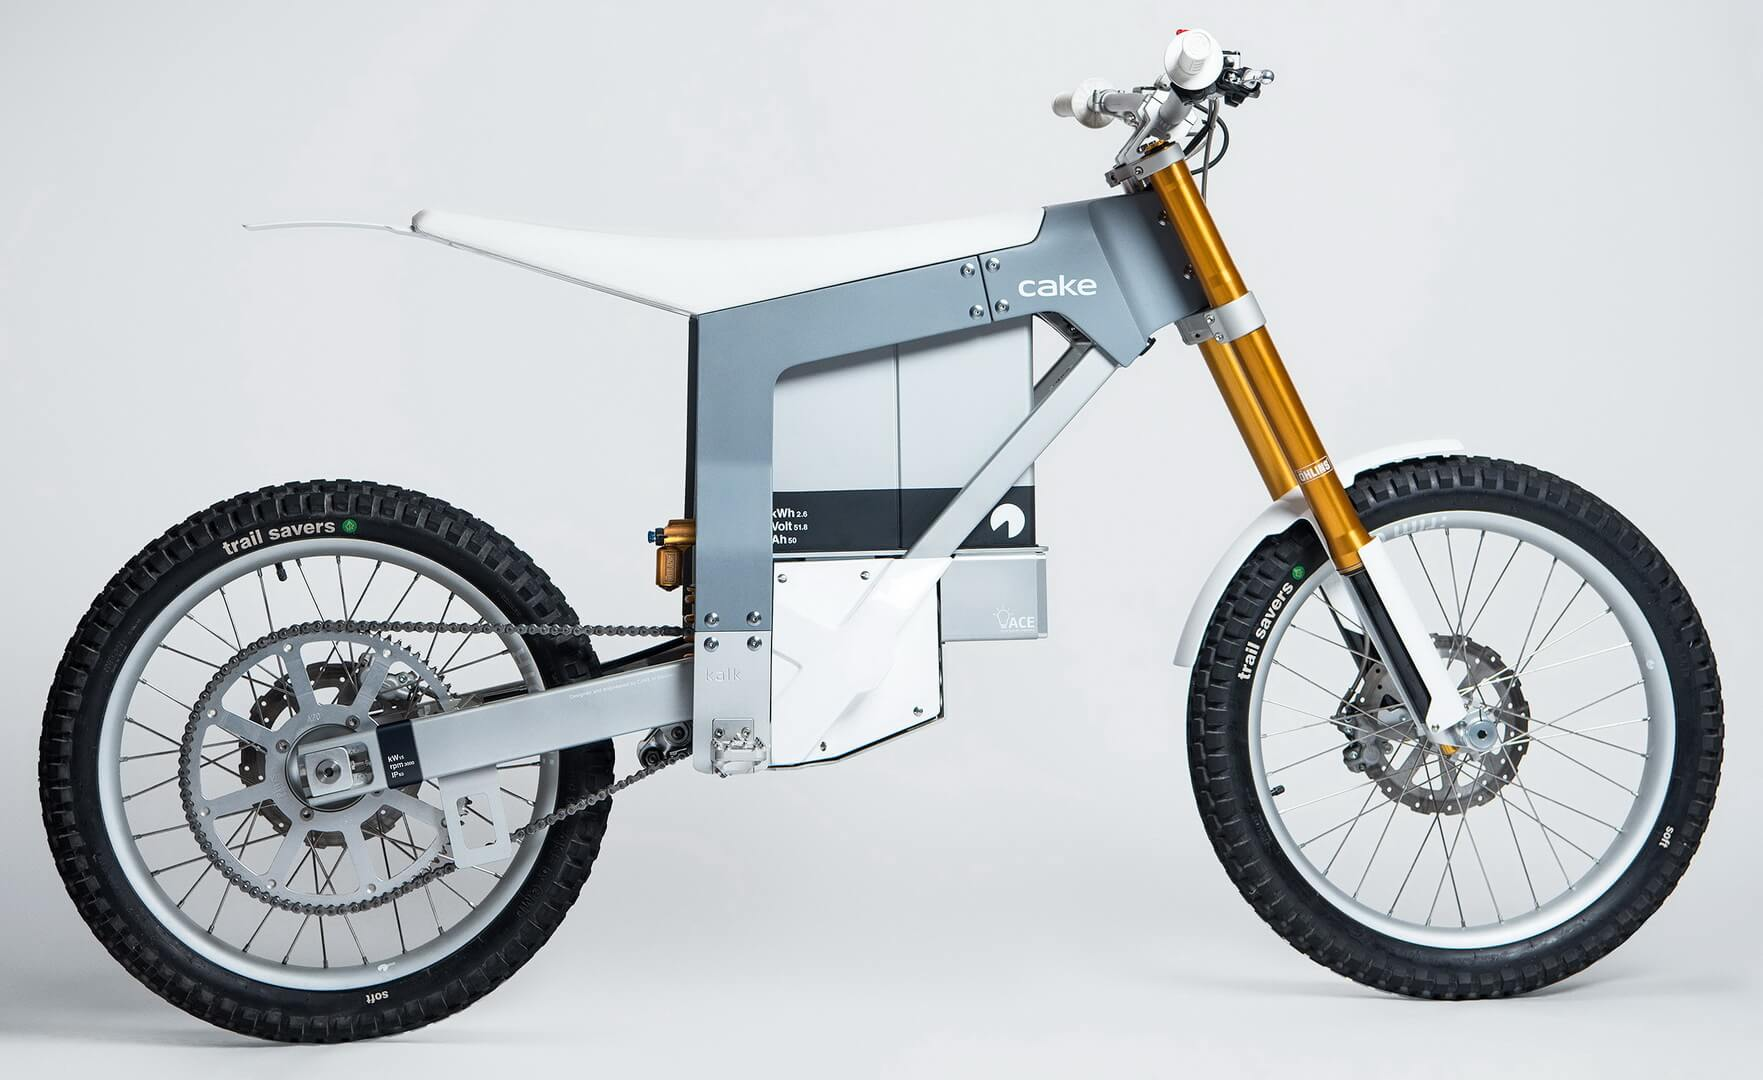 Электромотоцикл Kalk OR